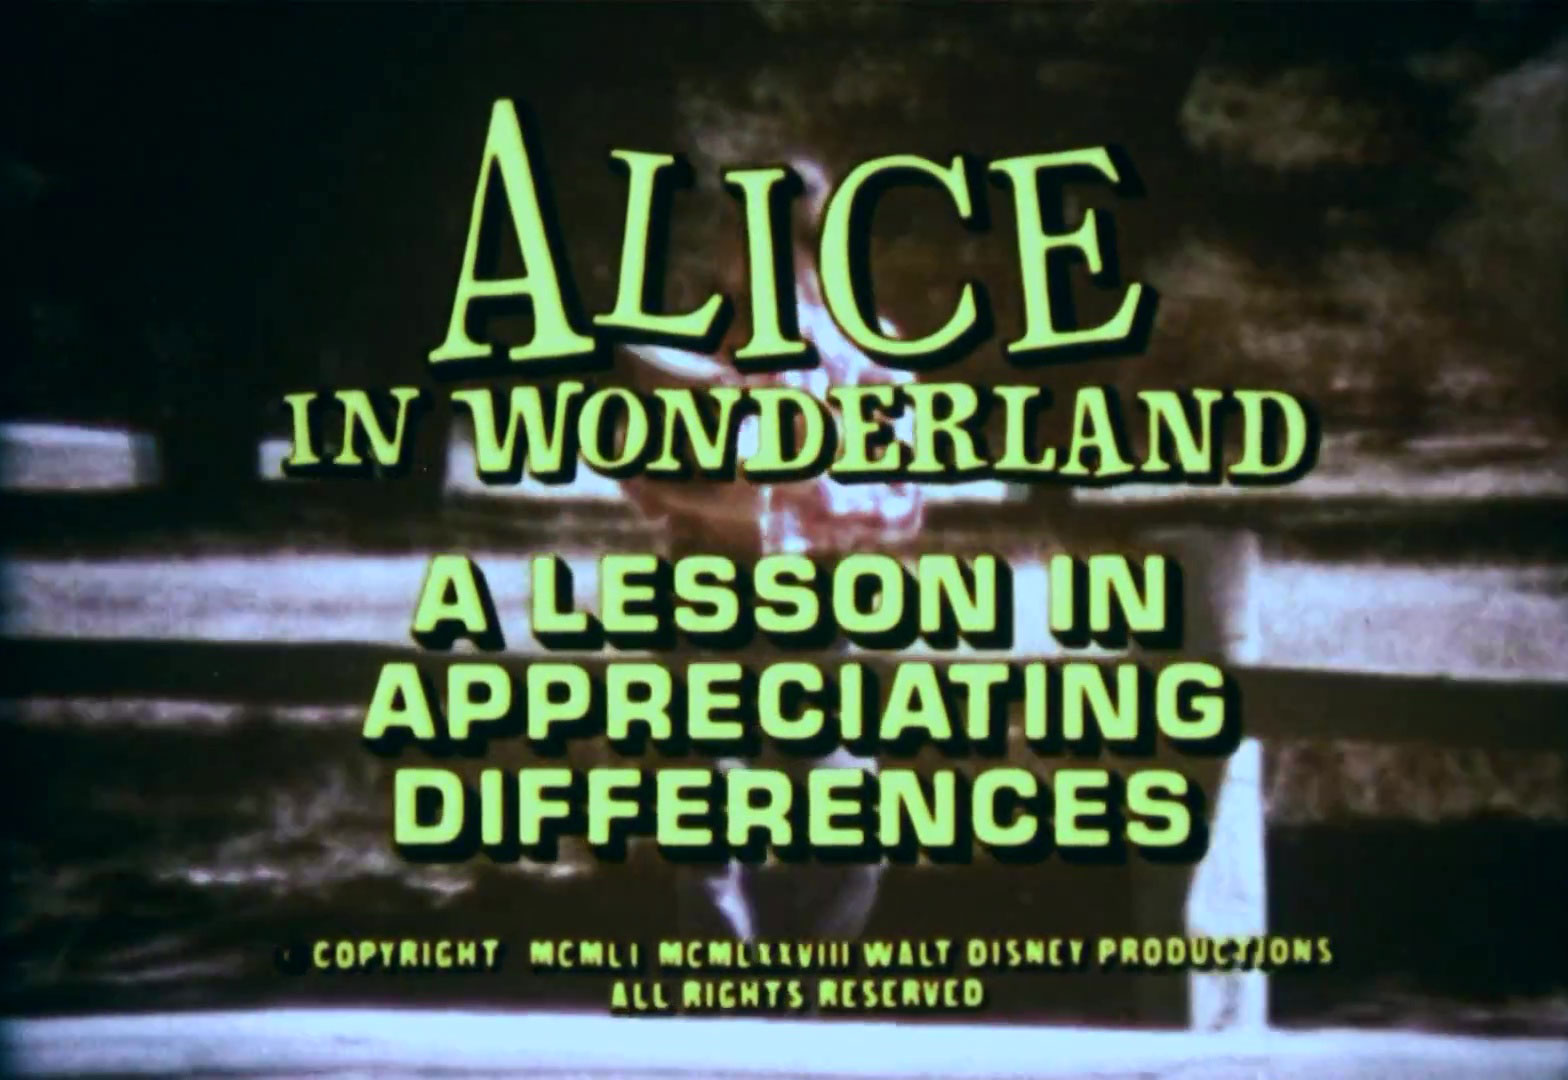 affiche poster alice wonderland lesson appreciating differences disney